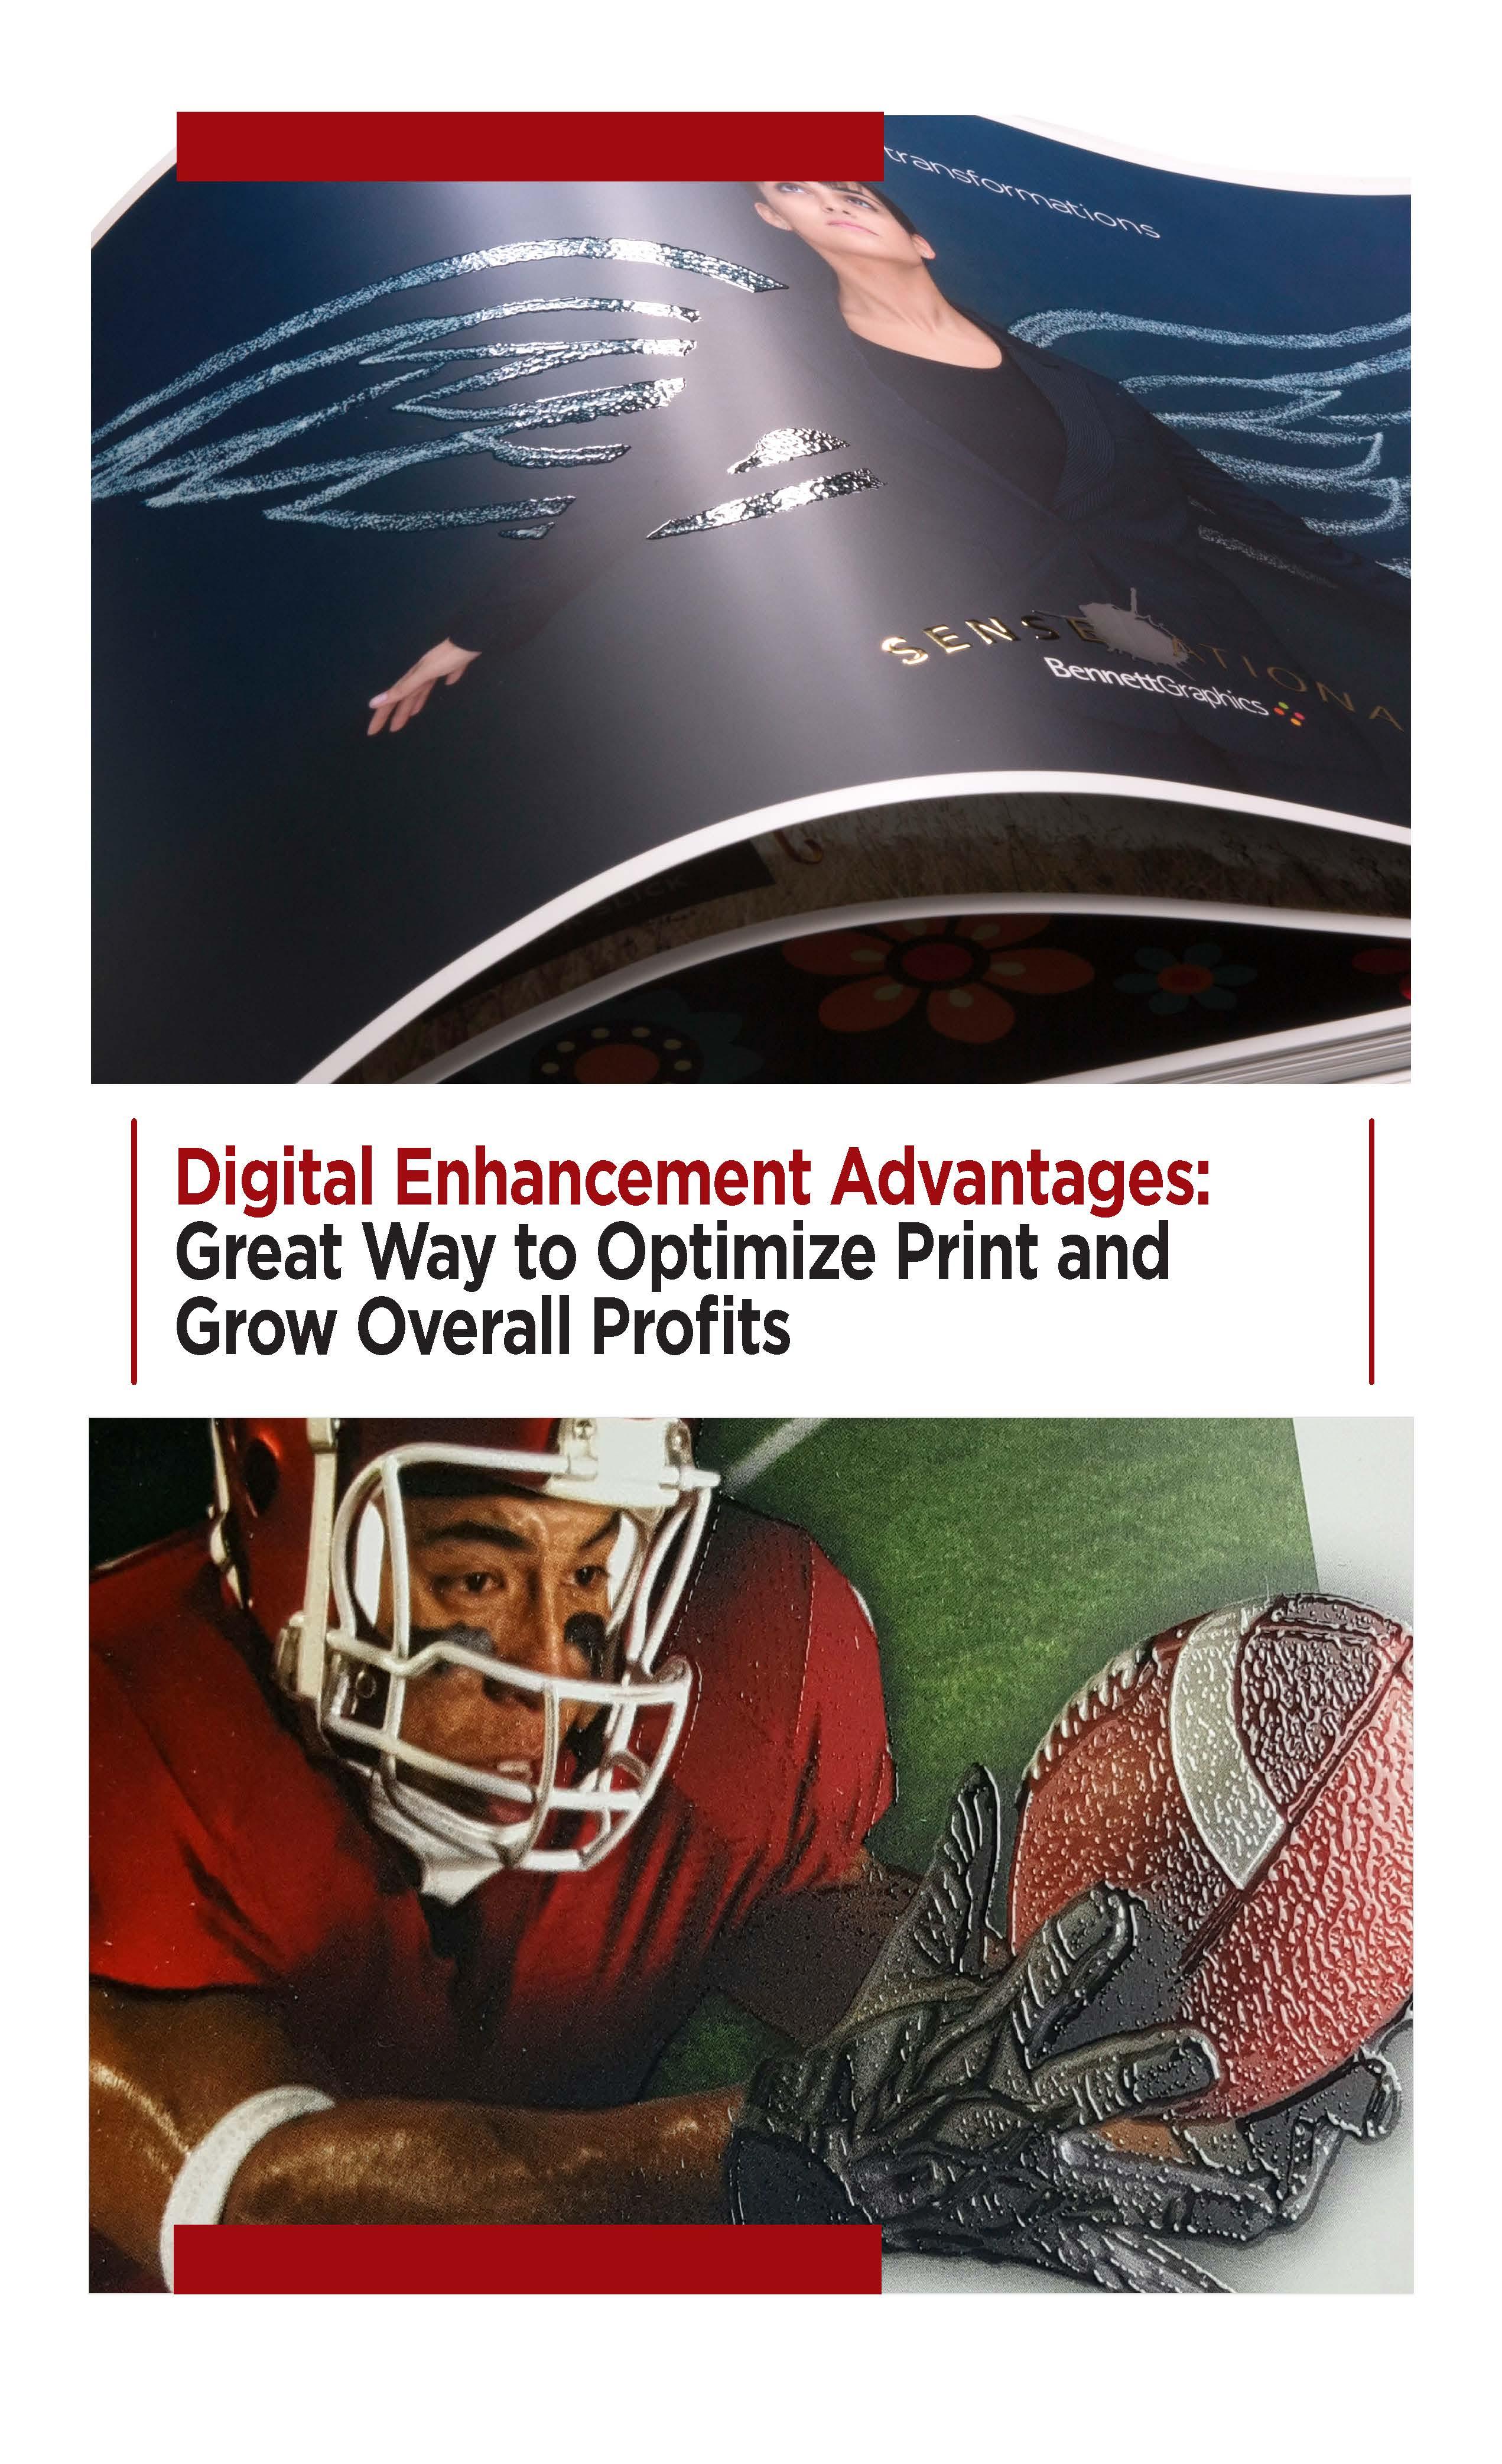 Digital Enhancement Advantages Printing Impressions